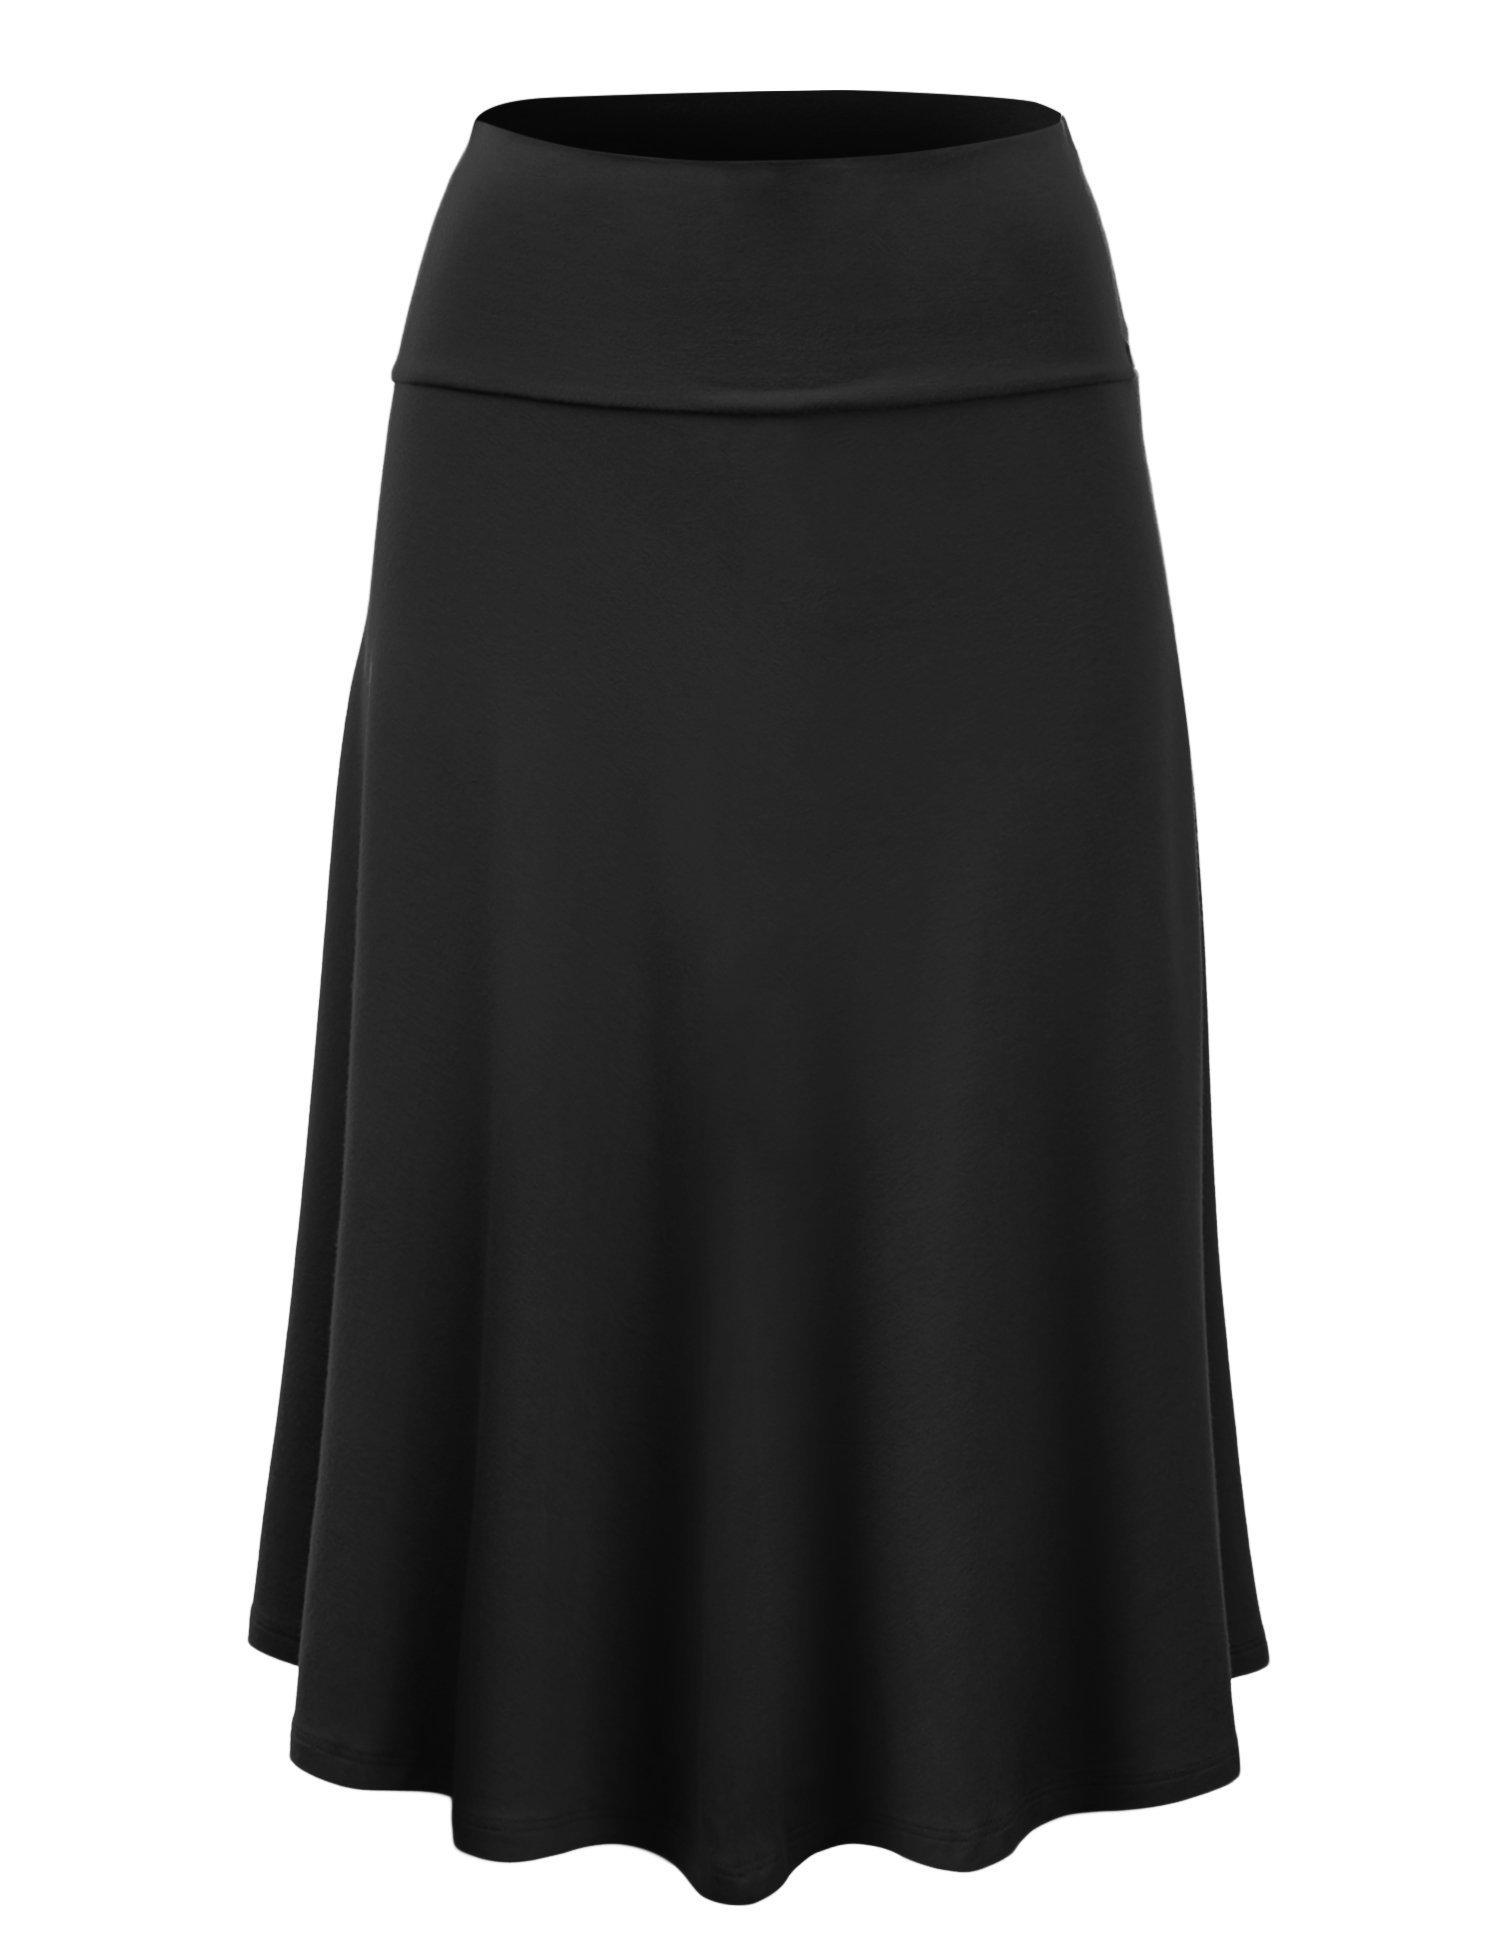 Lock and Love WB1105 Womens Lightweight Fold Over Flared Midi Skirt S Black